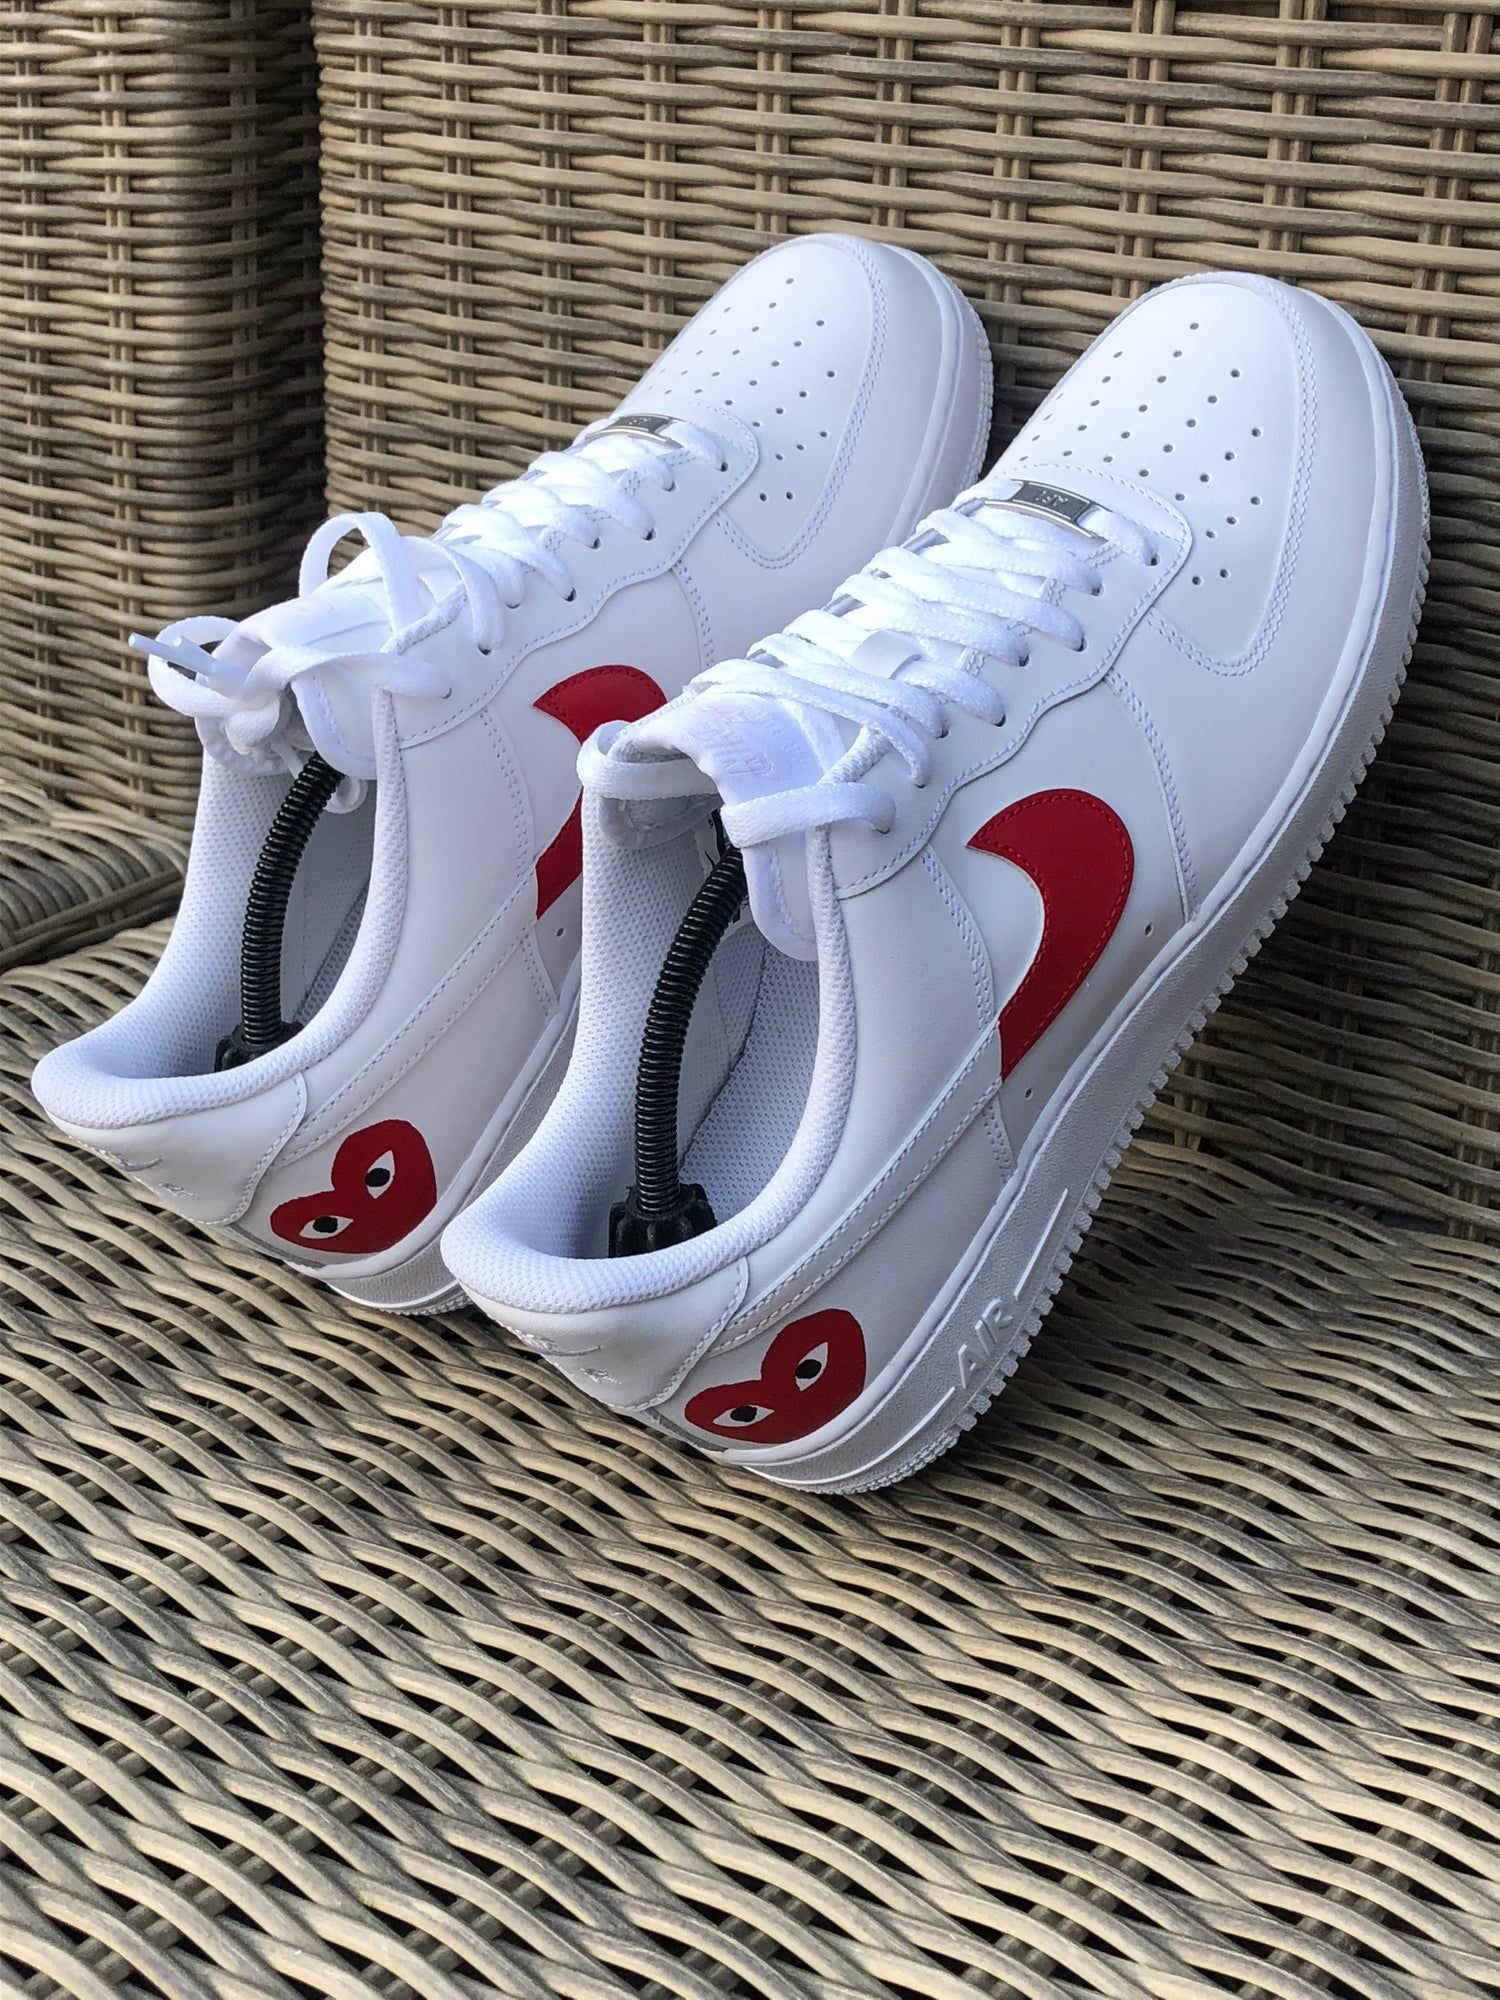 Nike Air Force 1 X Comme Des Garçons | Nike shoes air force, Nike ...